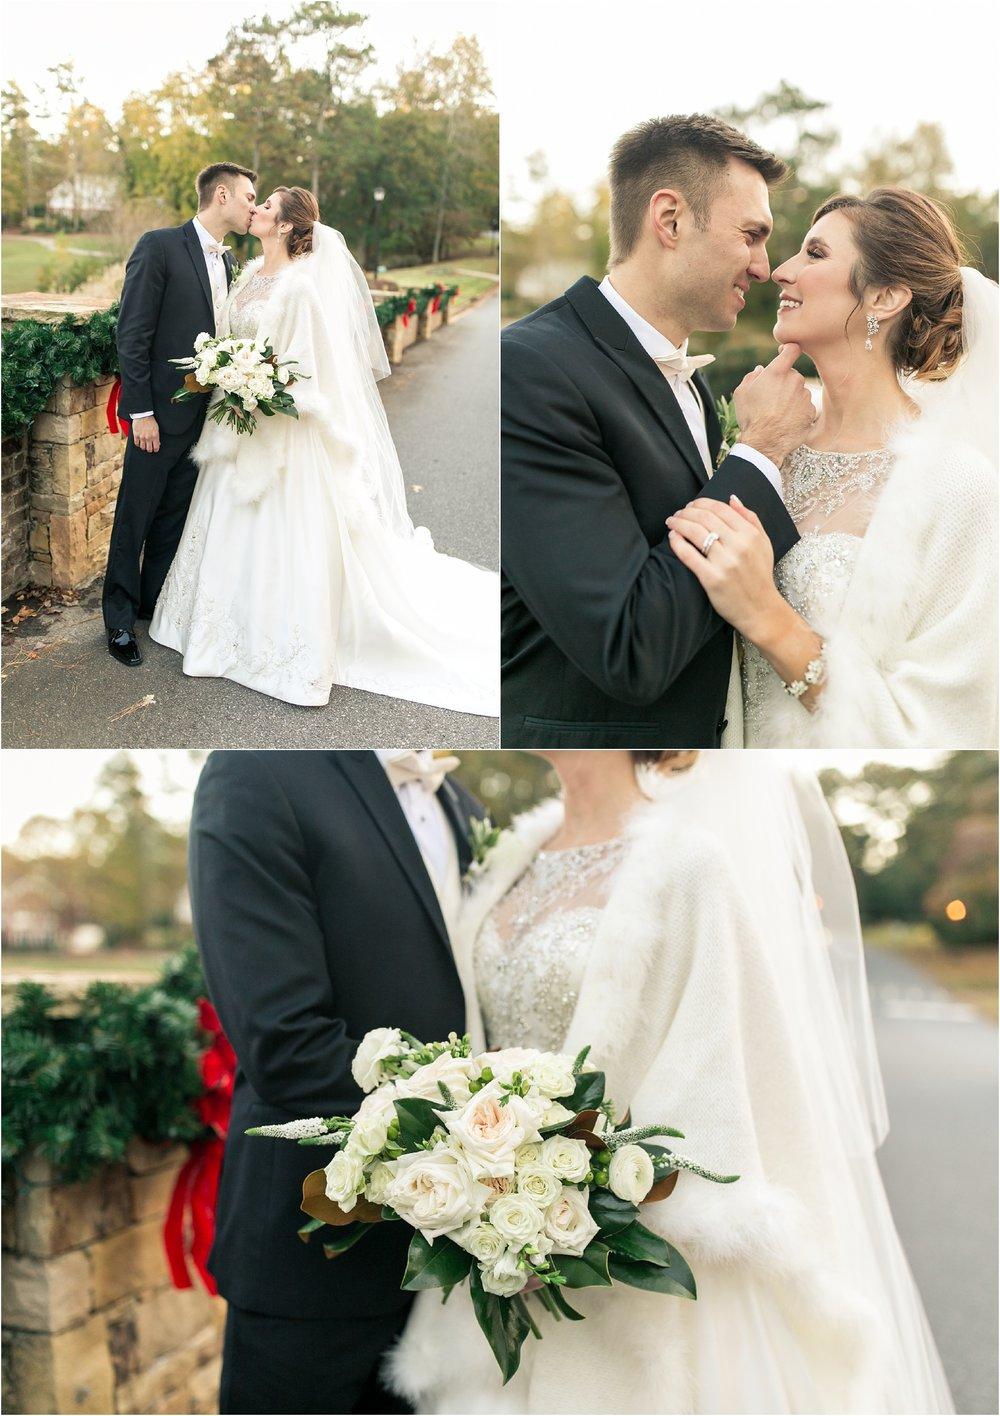 Savannah Eve Photography- Bottiglion-Scope Wedding- Sneak Peek-56.jpg